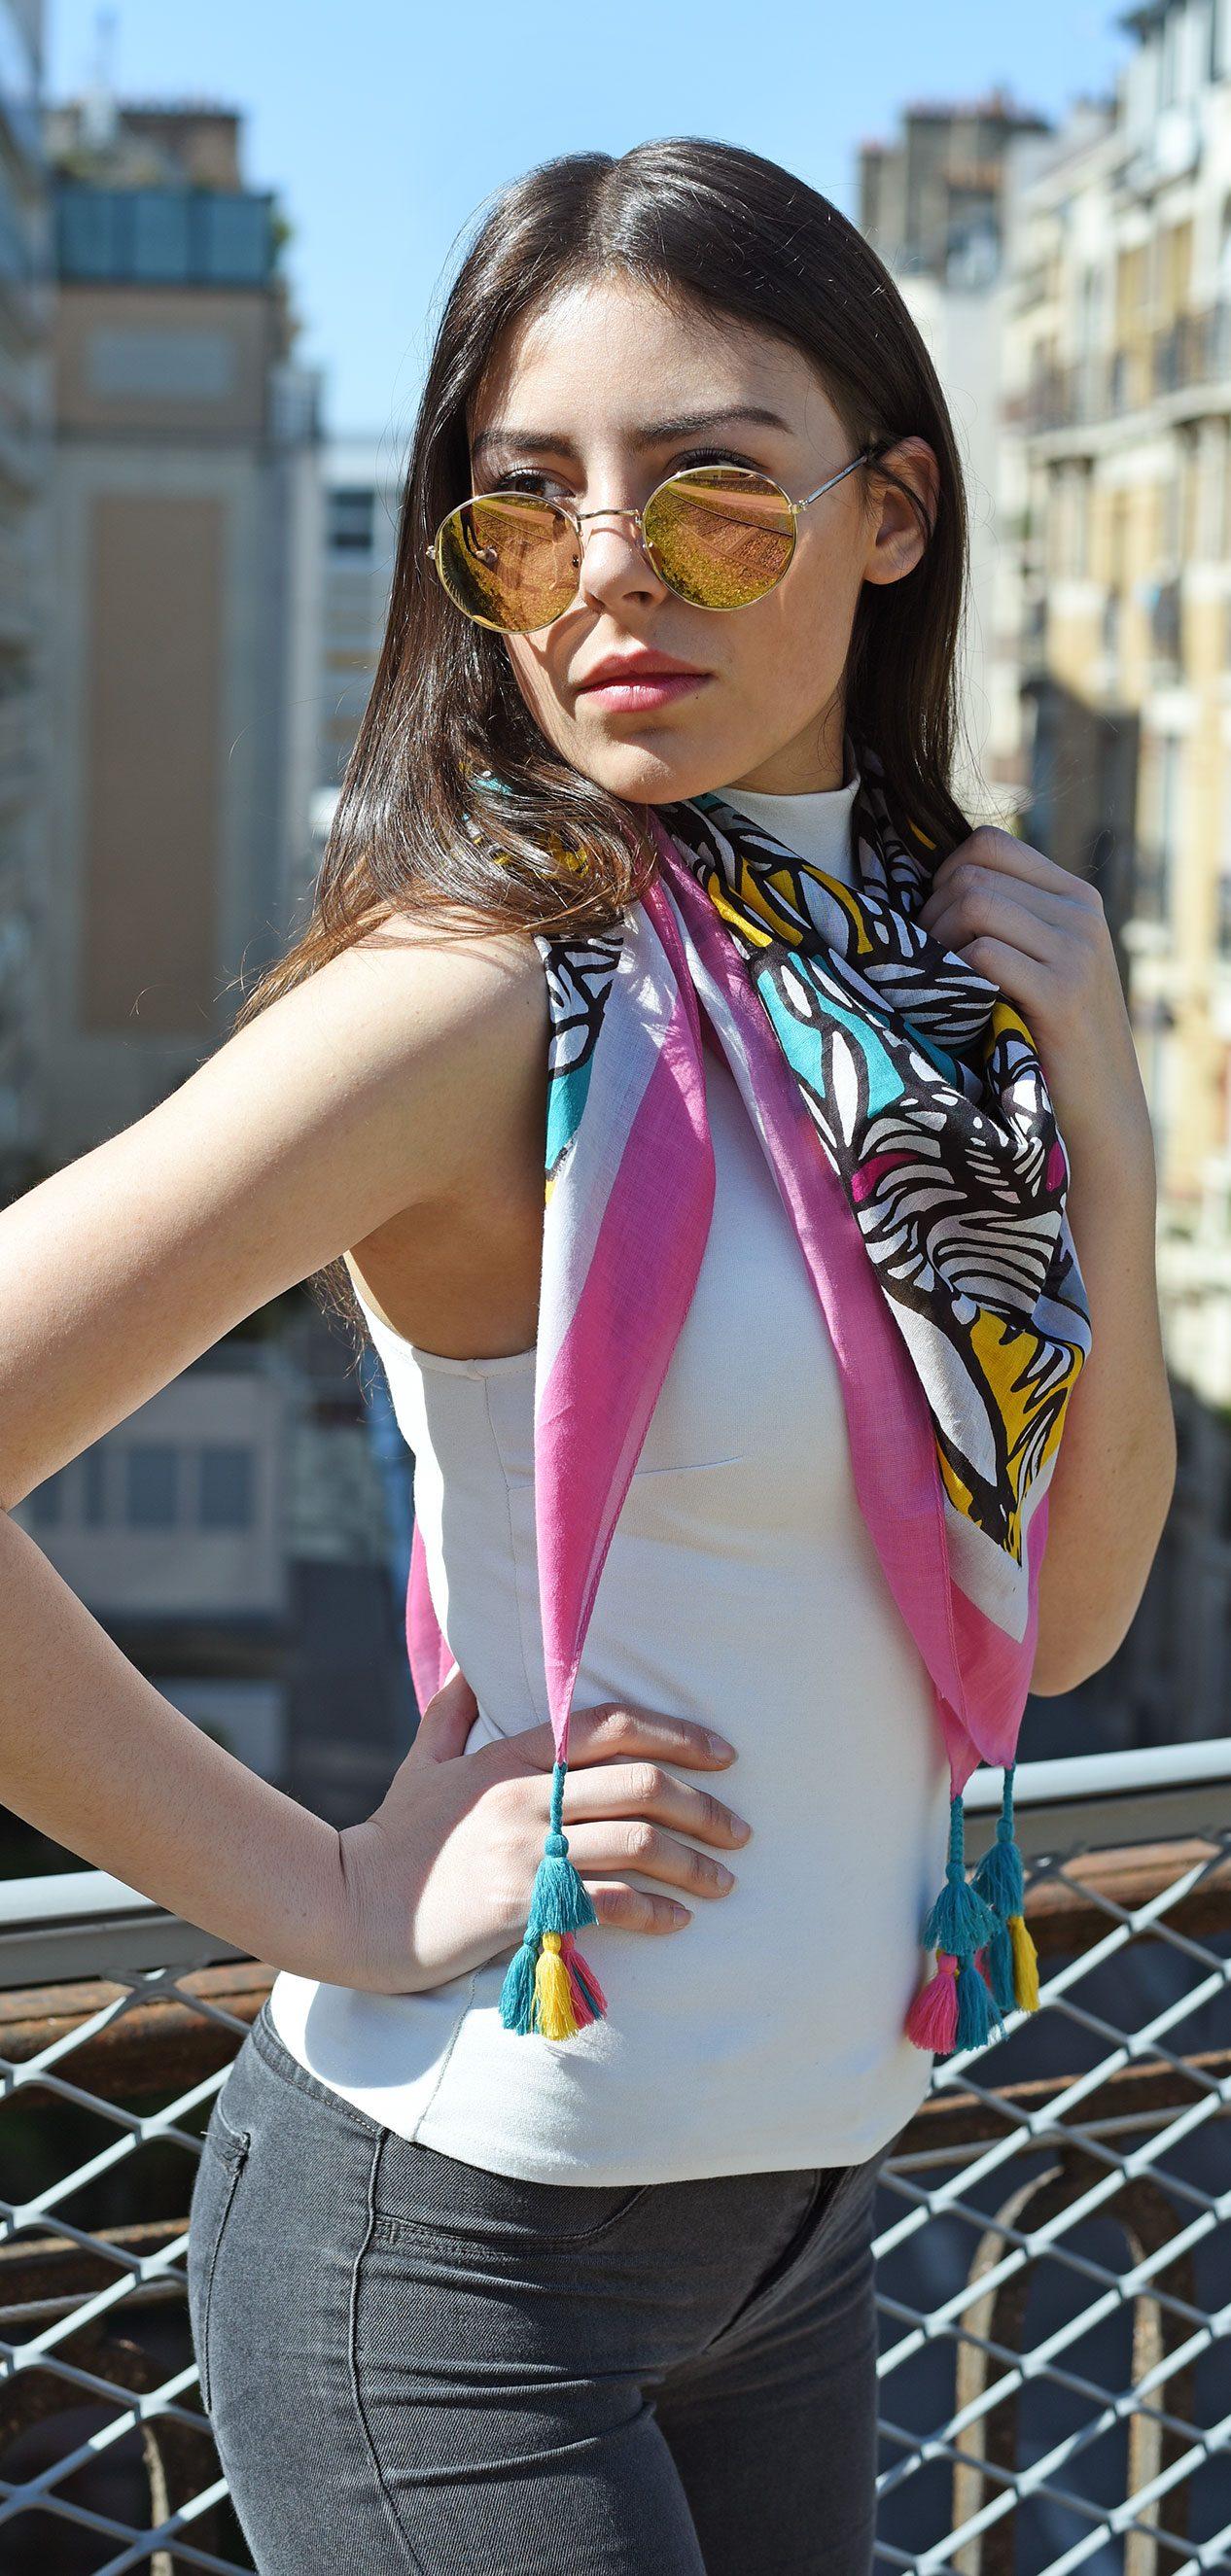 http://lookbook.allee-du-foulard.fr/wp-content/uploads/2018/05/0662-ADF-Accessoires-de-mode-LB-Coll-ethnique-valoa-rose-2-1-1266x2650.jpg